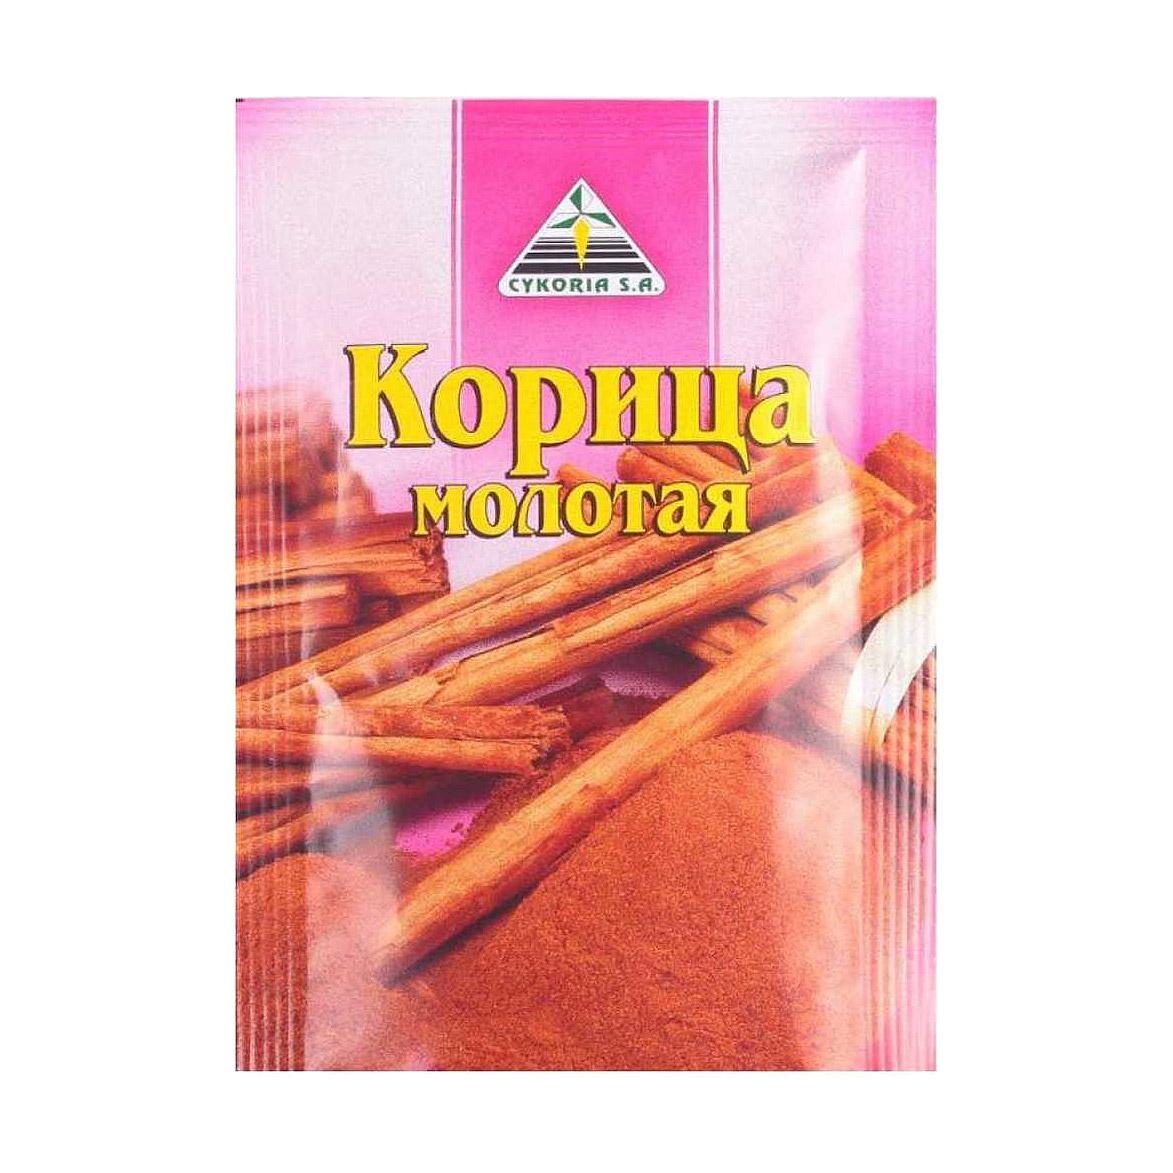 Корица молотая Cykoria 20 г kamis корица молотая для выпечки